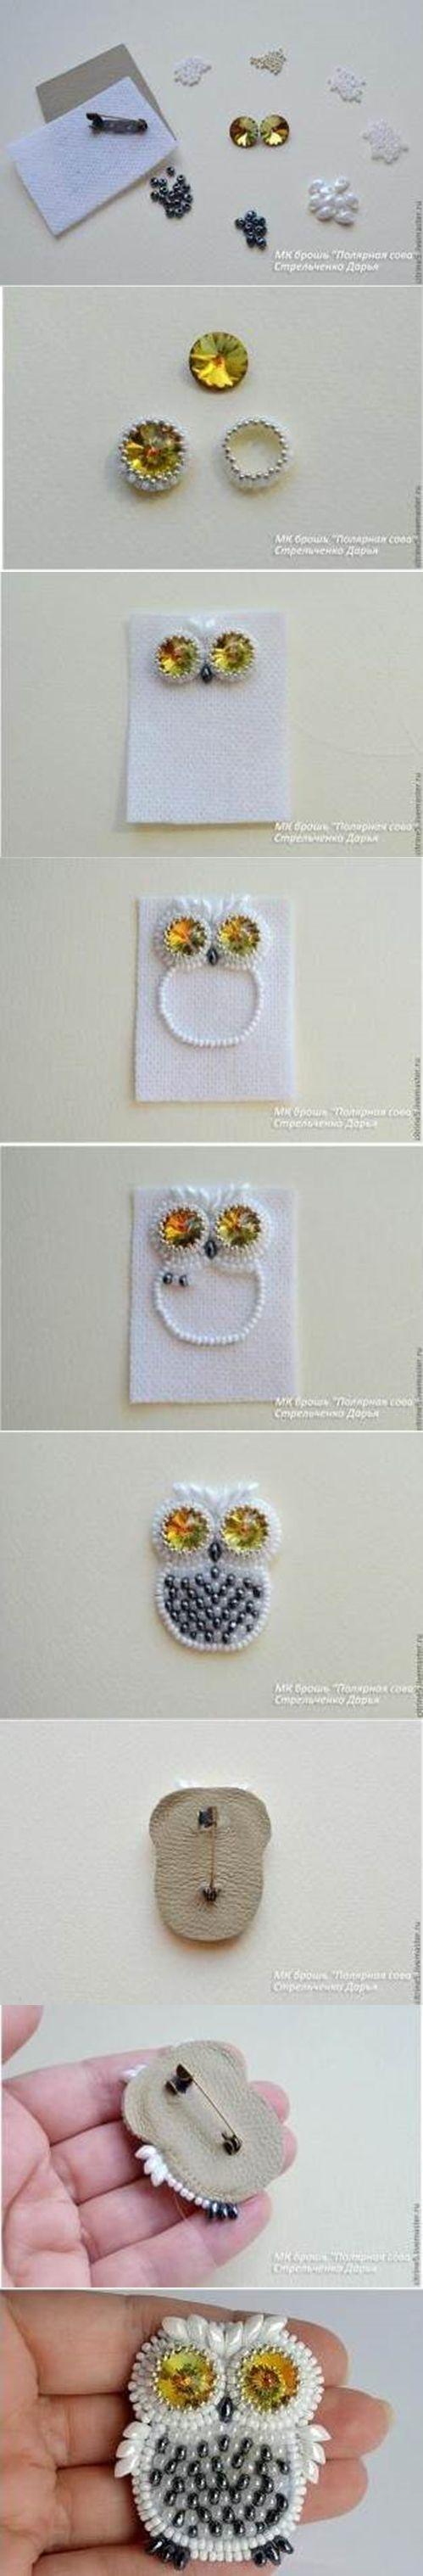 DIY Cute Beads Owl Pin | iCreativeIdeas.com LIKE Us on Facebook ==> https://www.facebook.com/icreativeideas